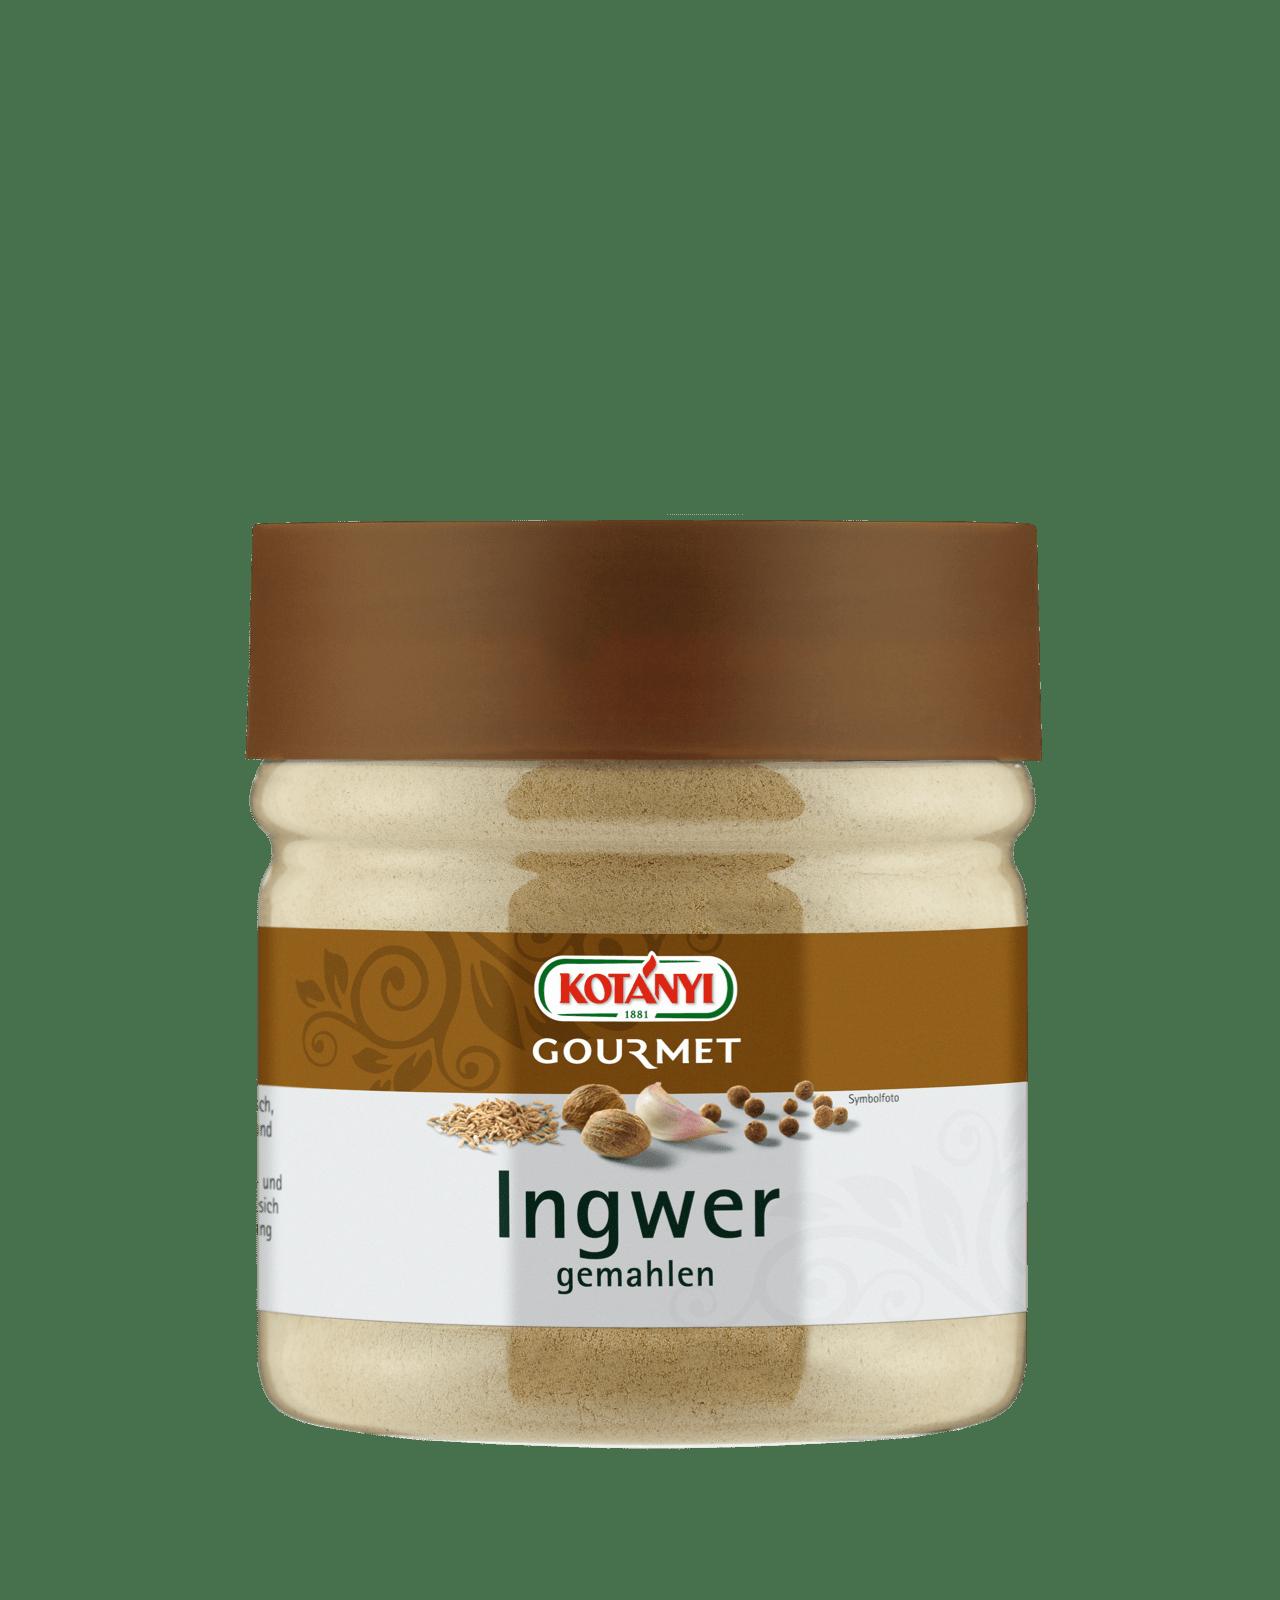 Kotányi Gourmet Ingwer gemahlen in der 400ccm Dose